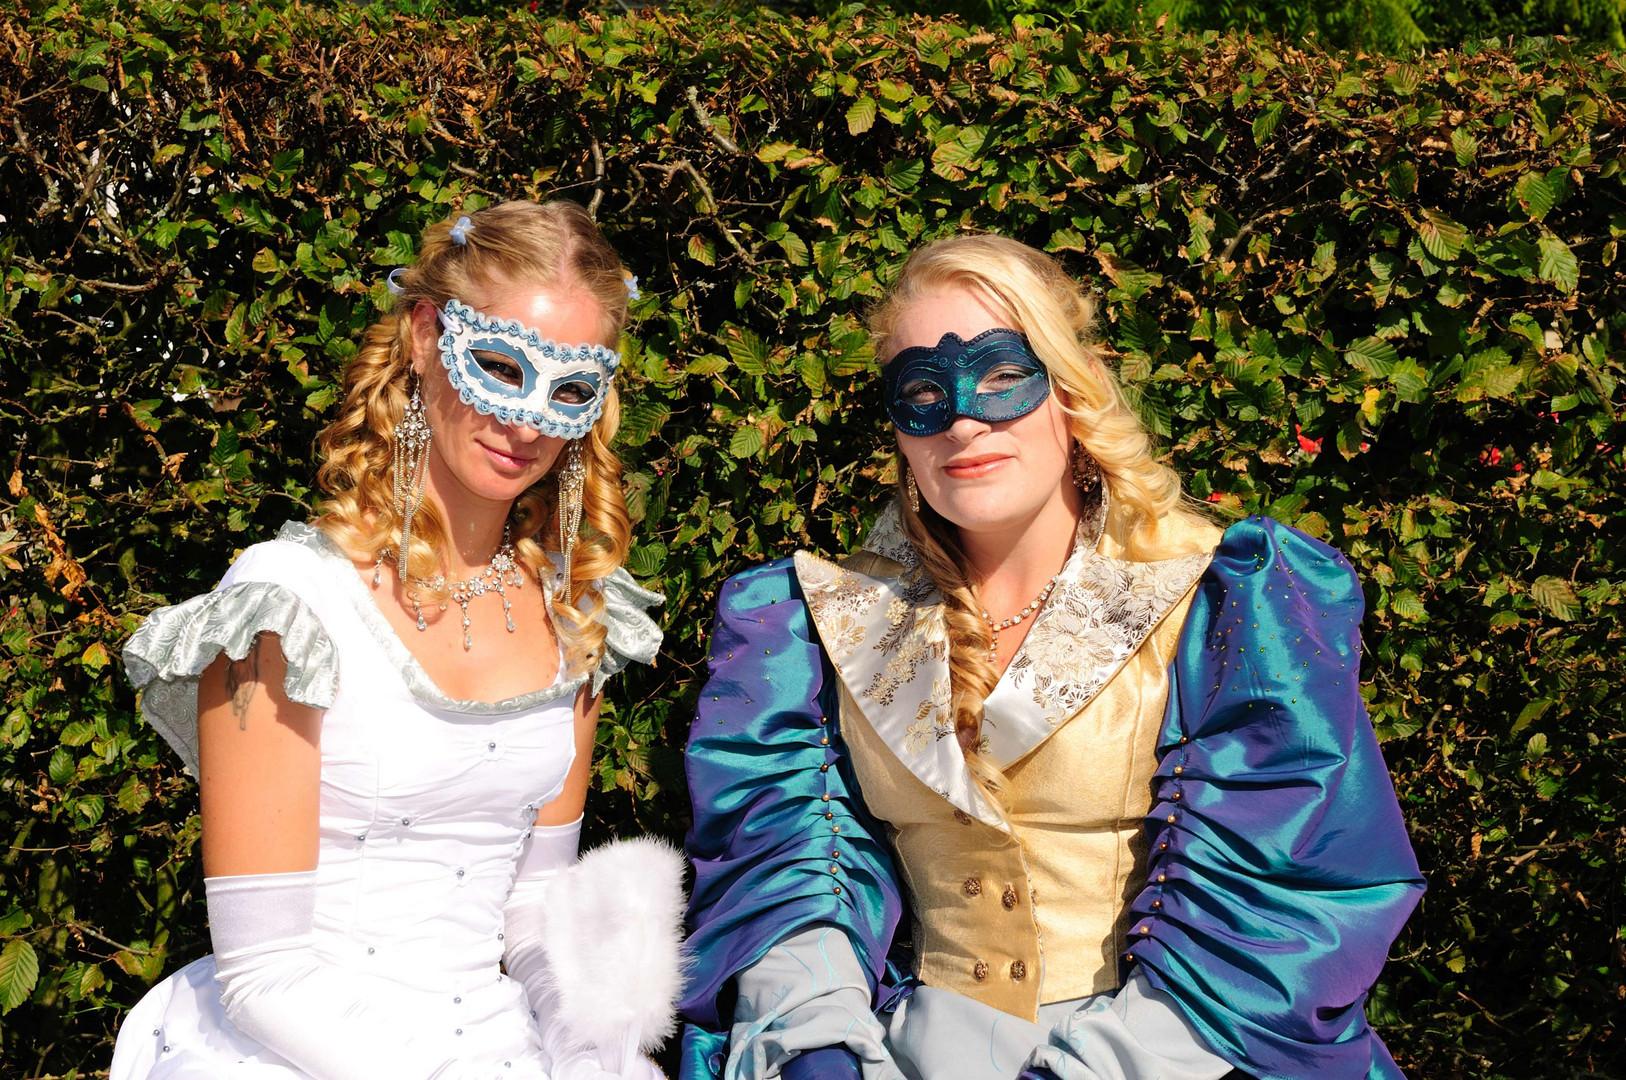 Elf Fantasy Fair Arcen 2012